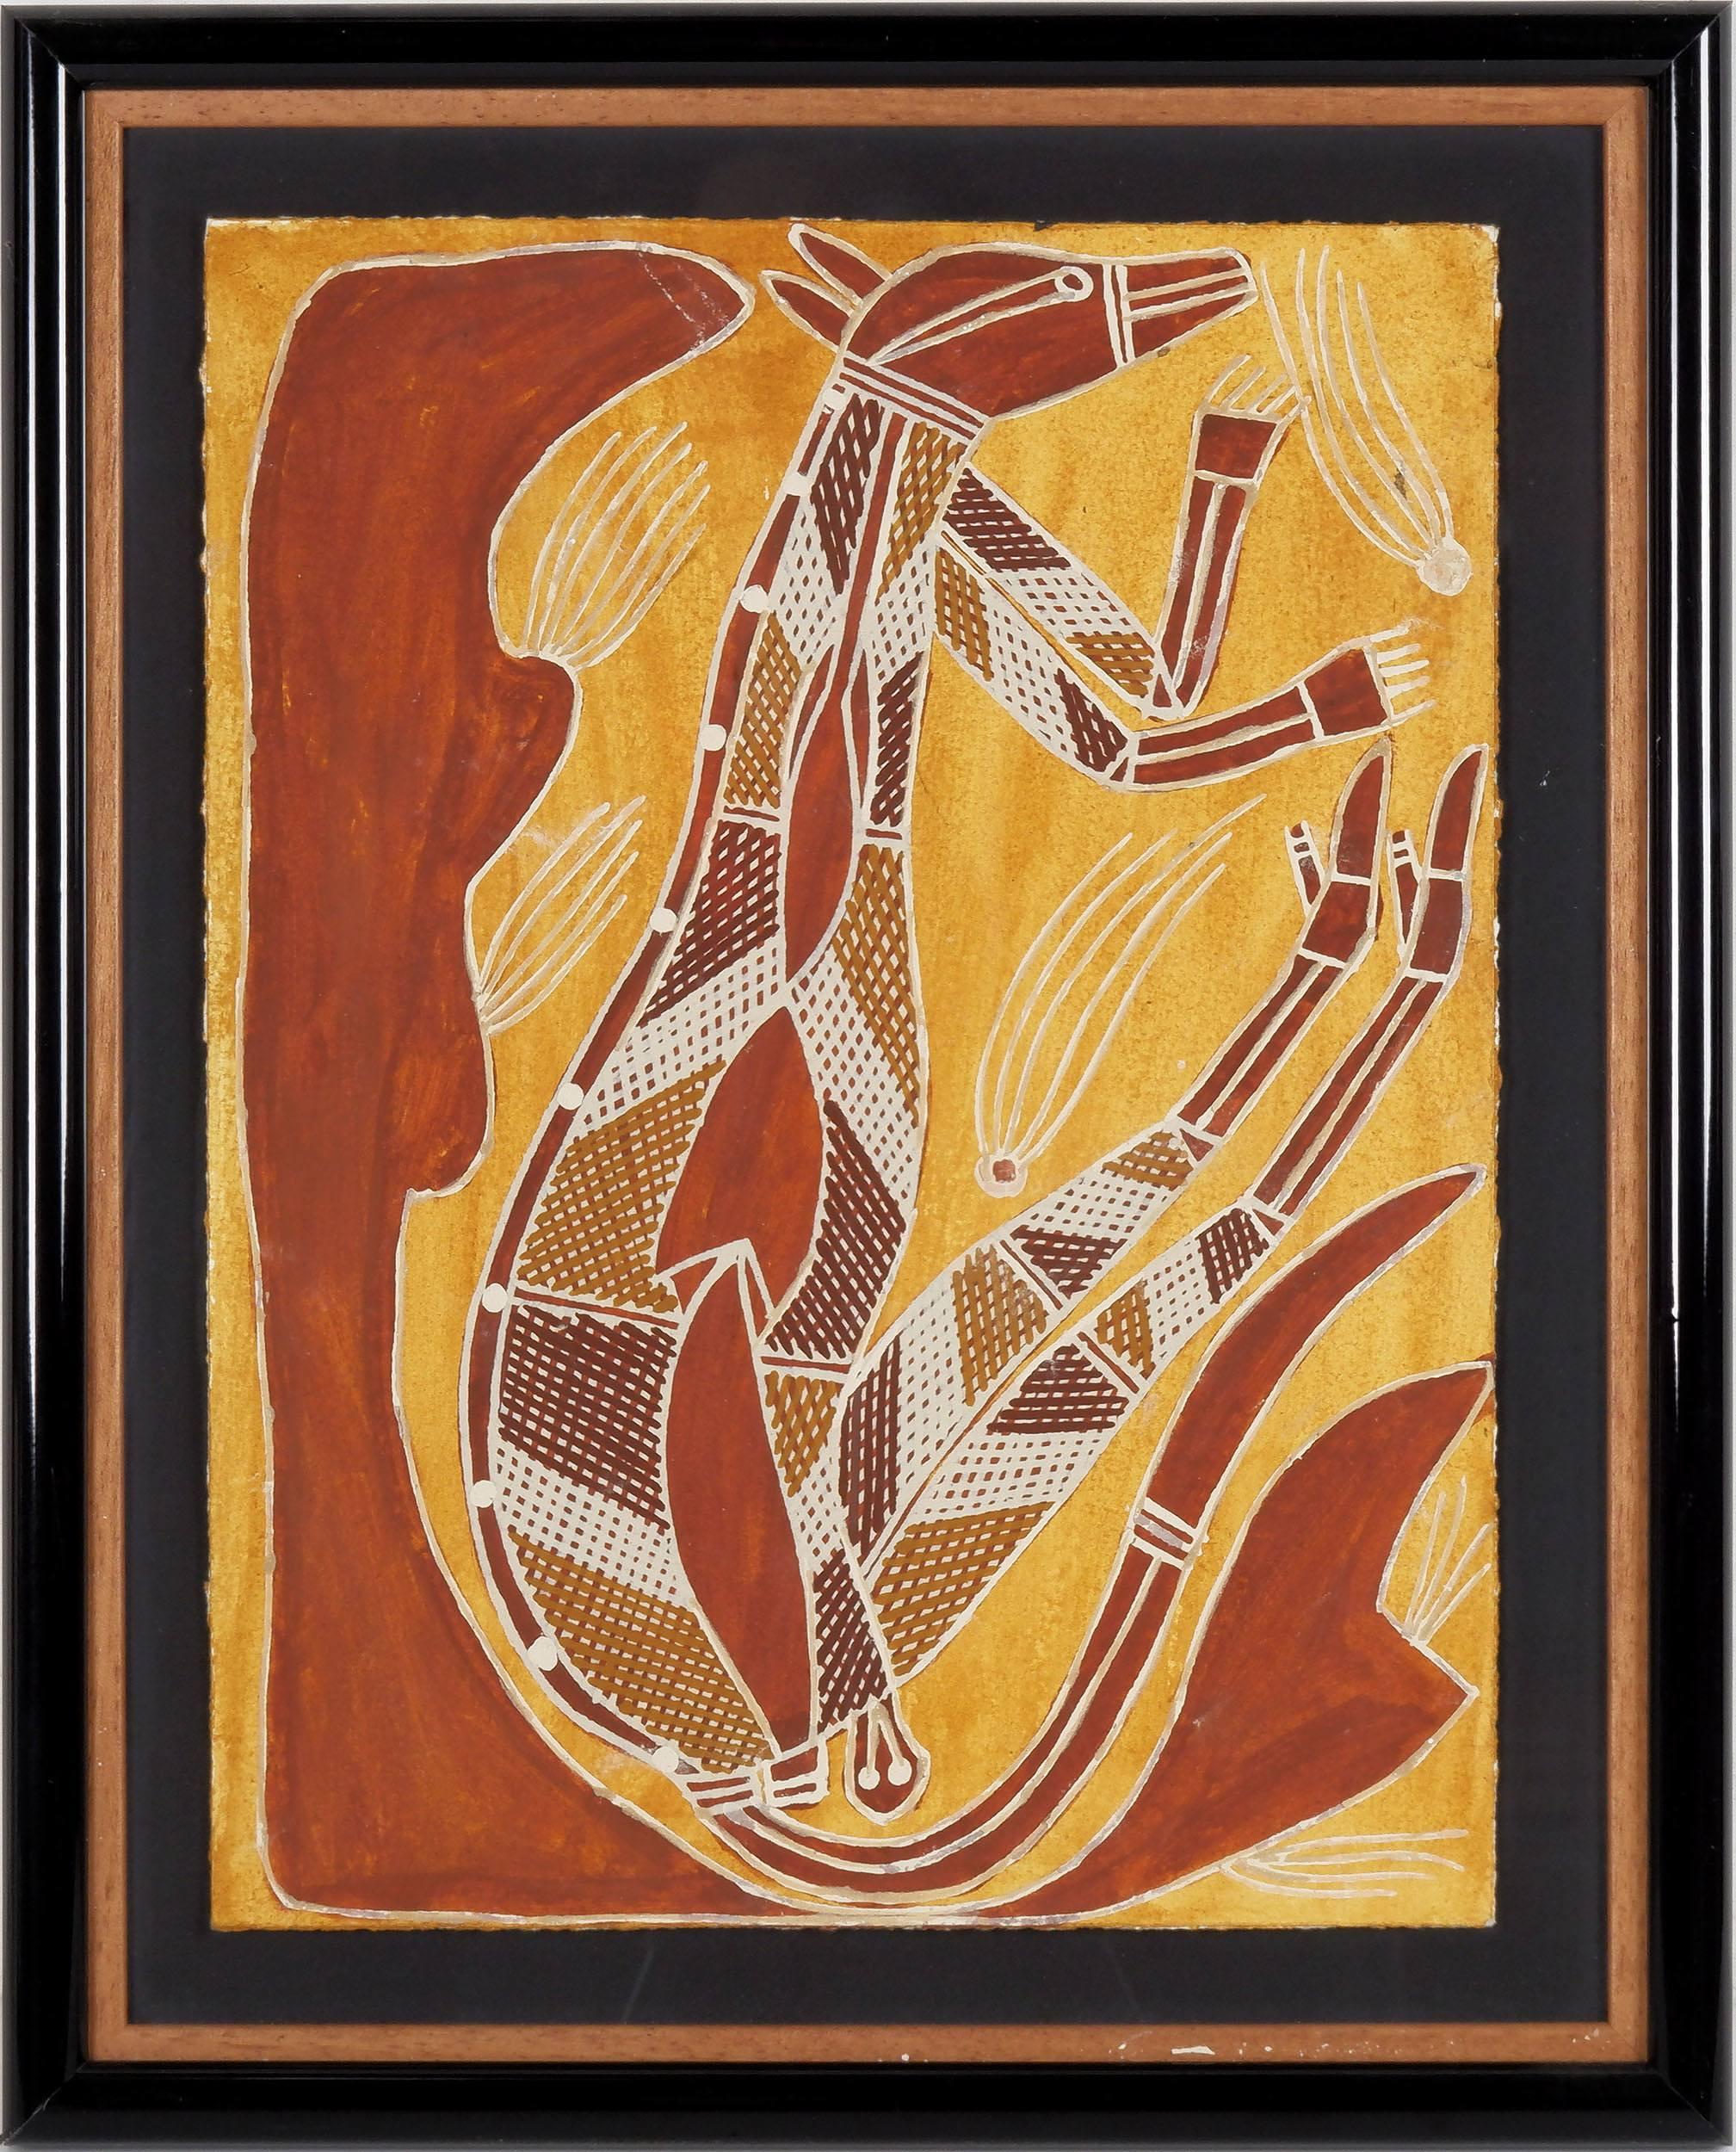 'Djawida Nadjongorle (c.1943-2008) Rock Wallaby, Acrylic and Ochre on Paper'